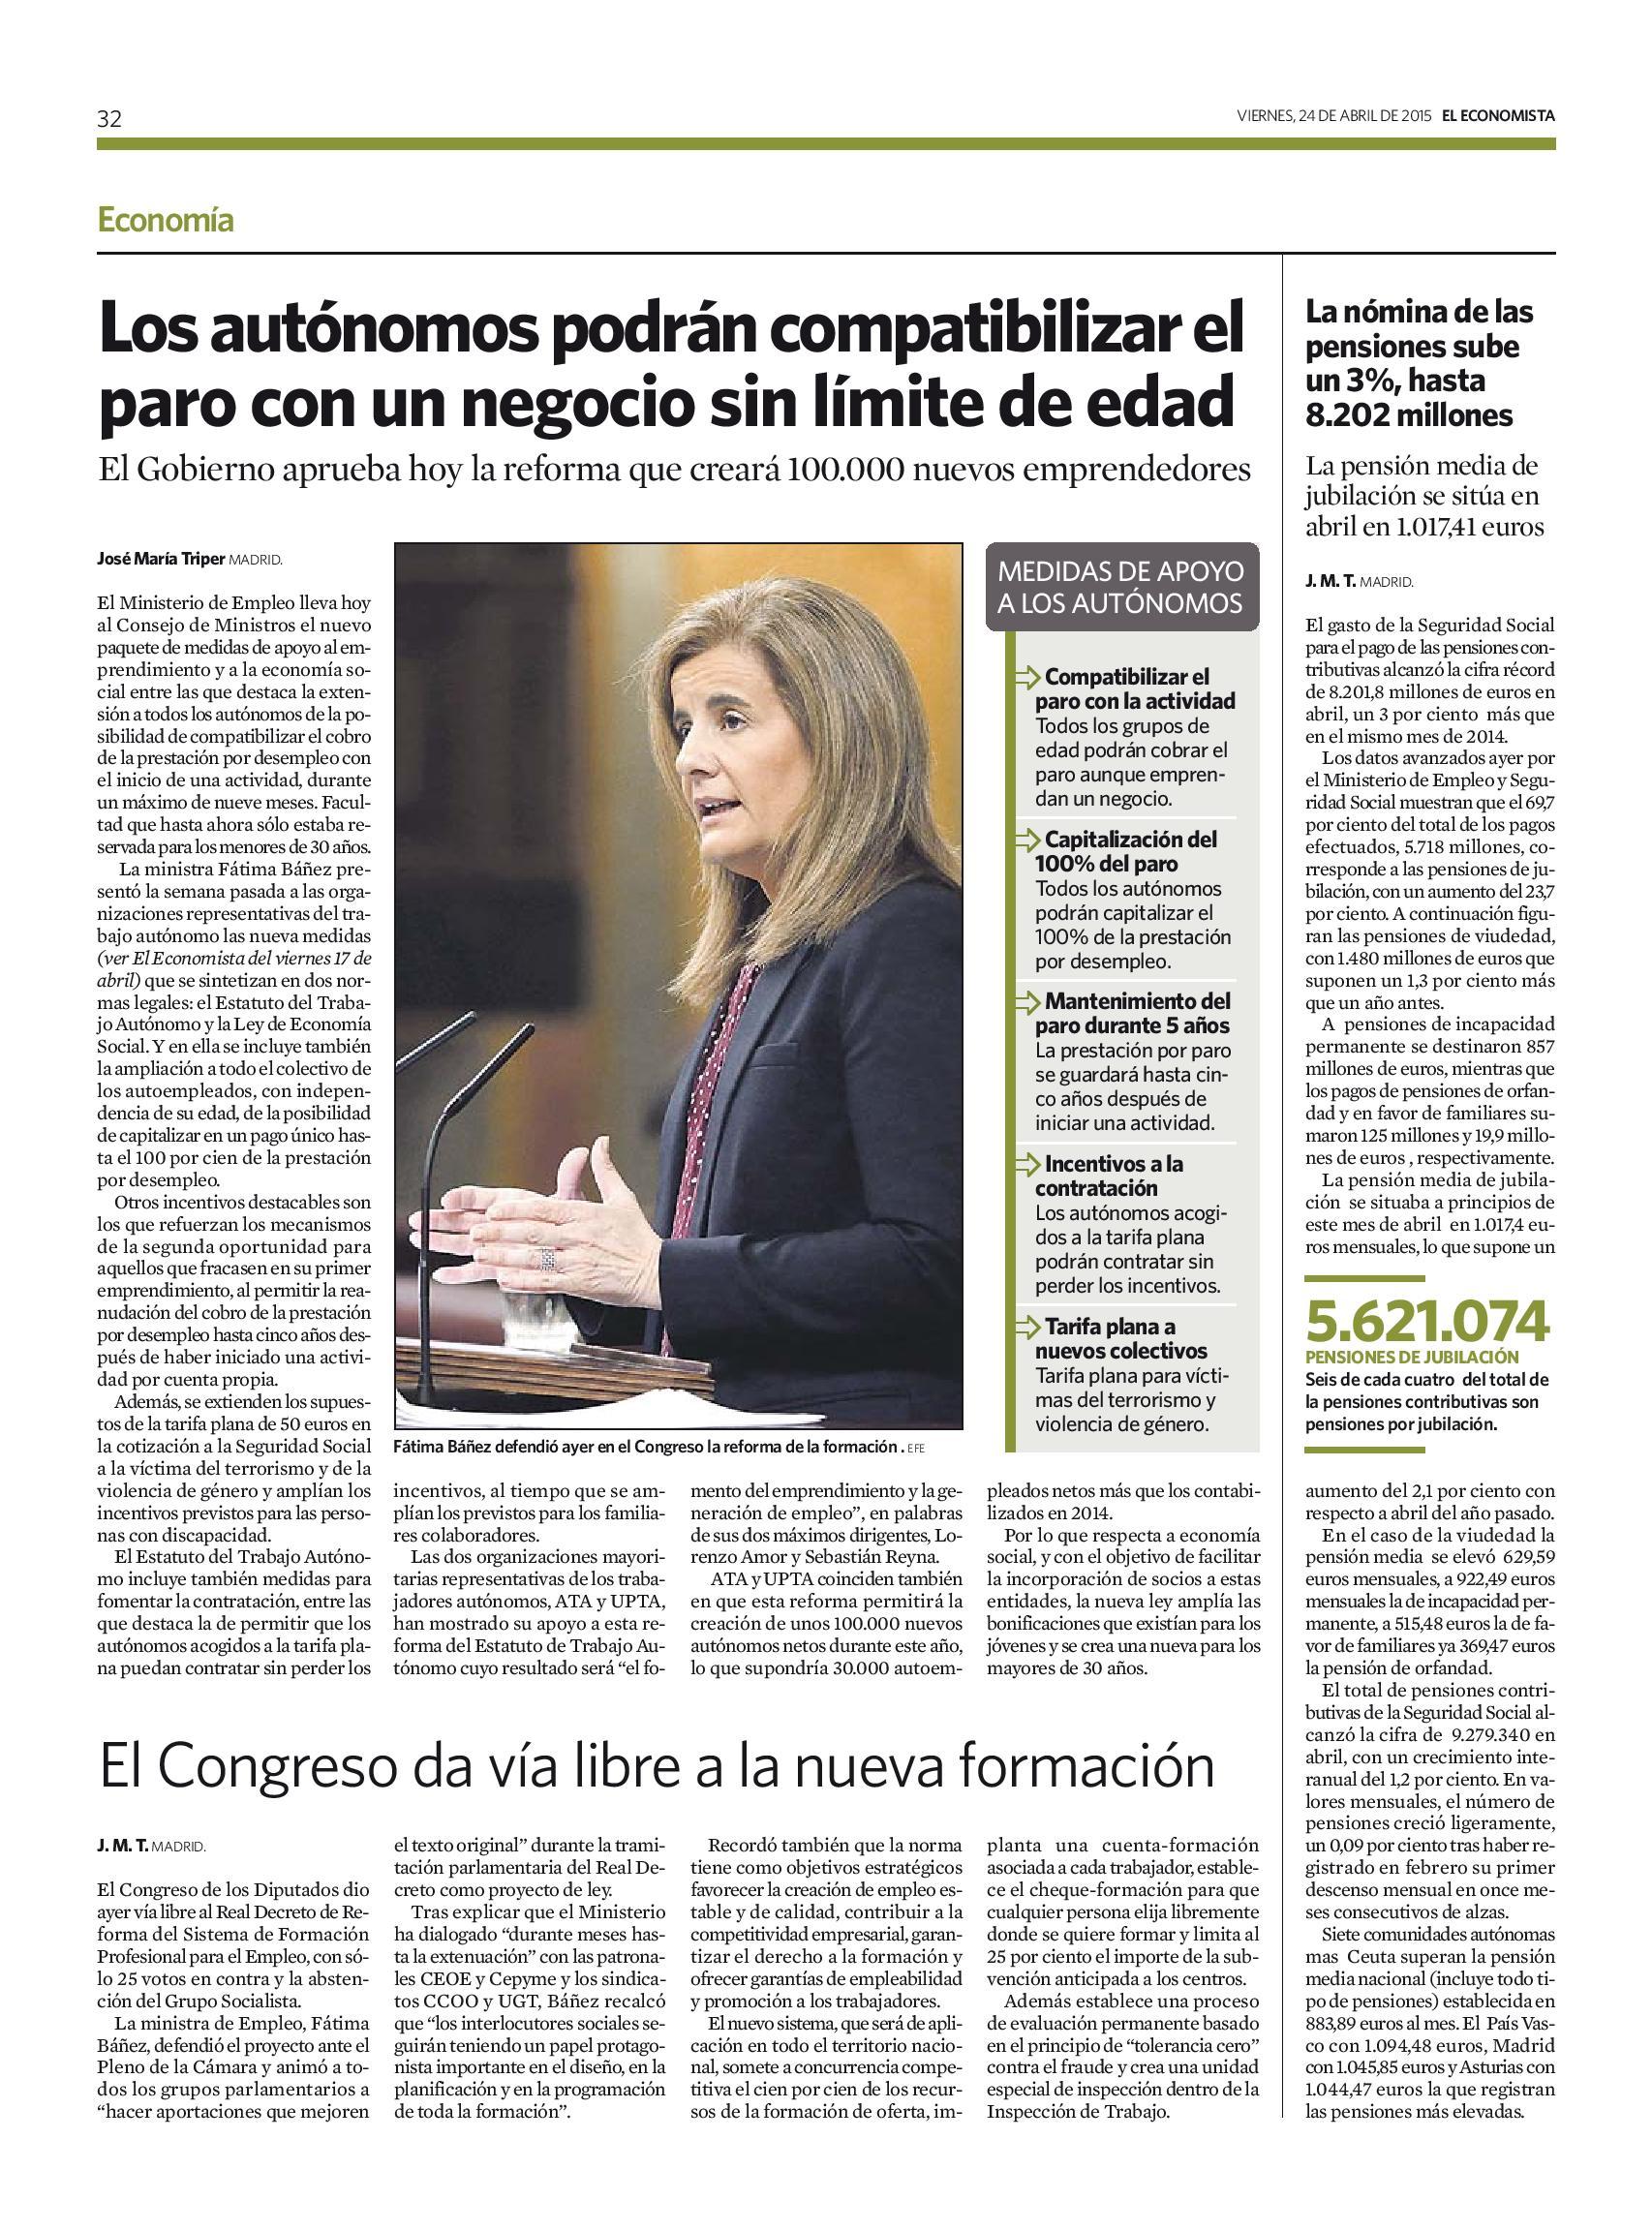 ElEconomista24042015_2-page-001